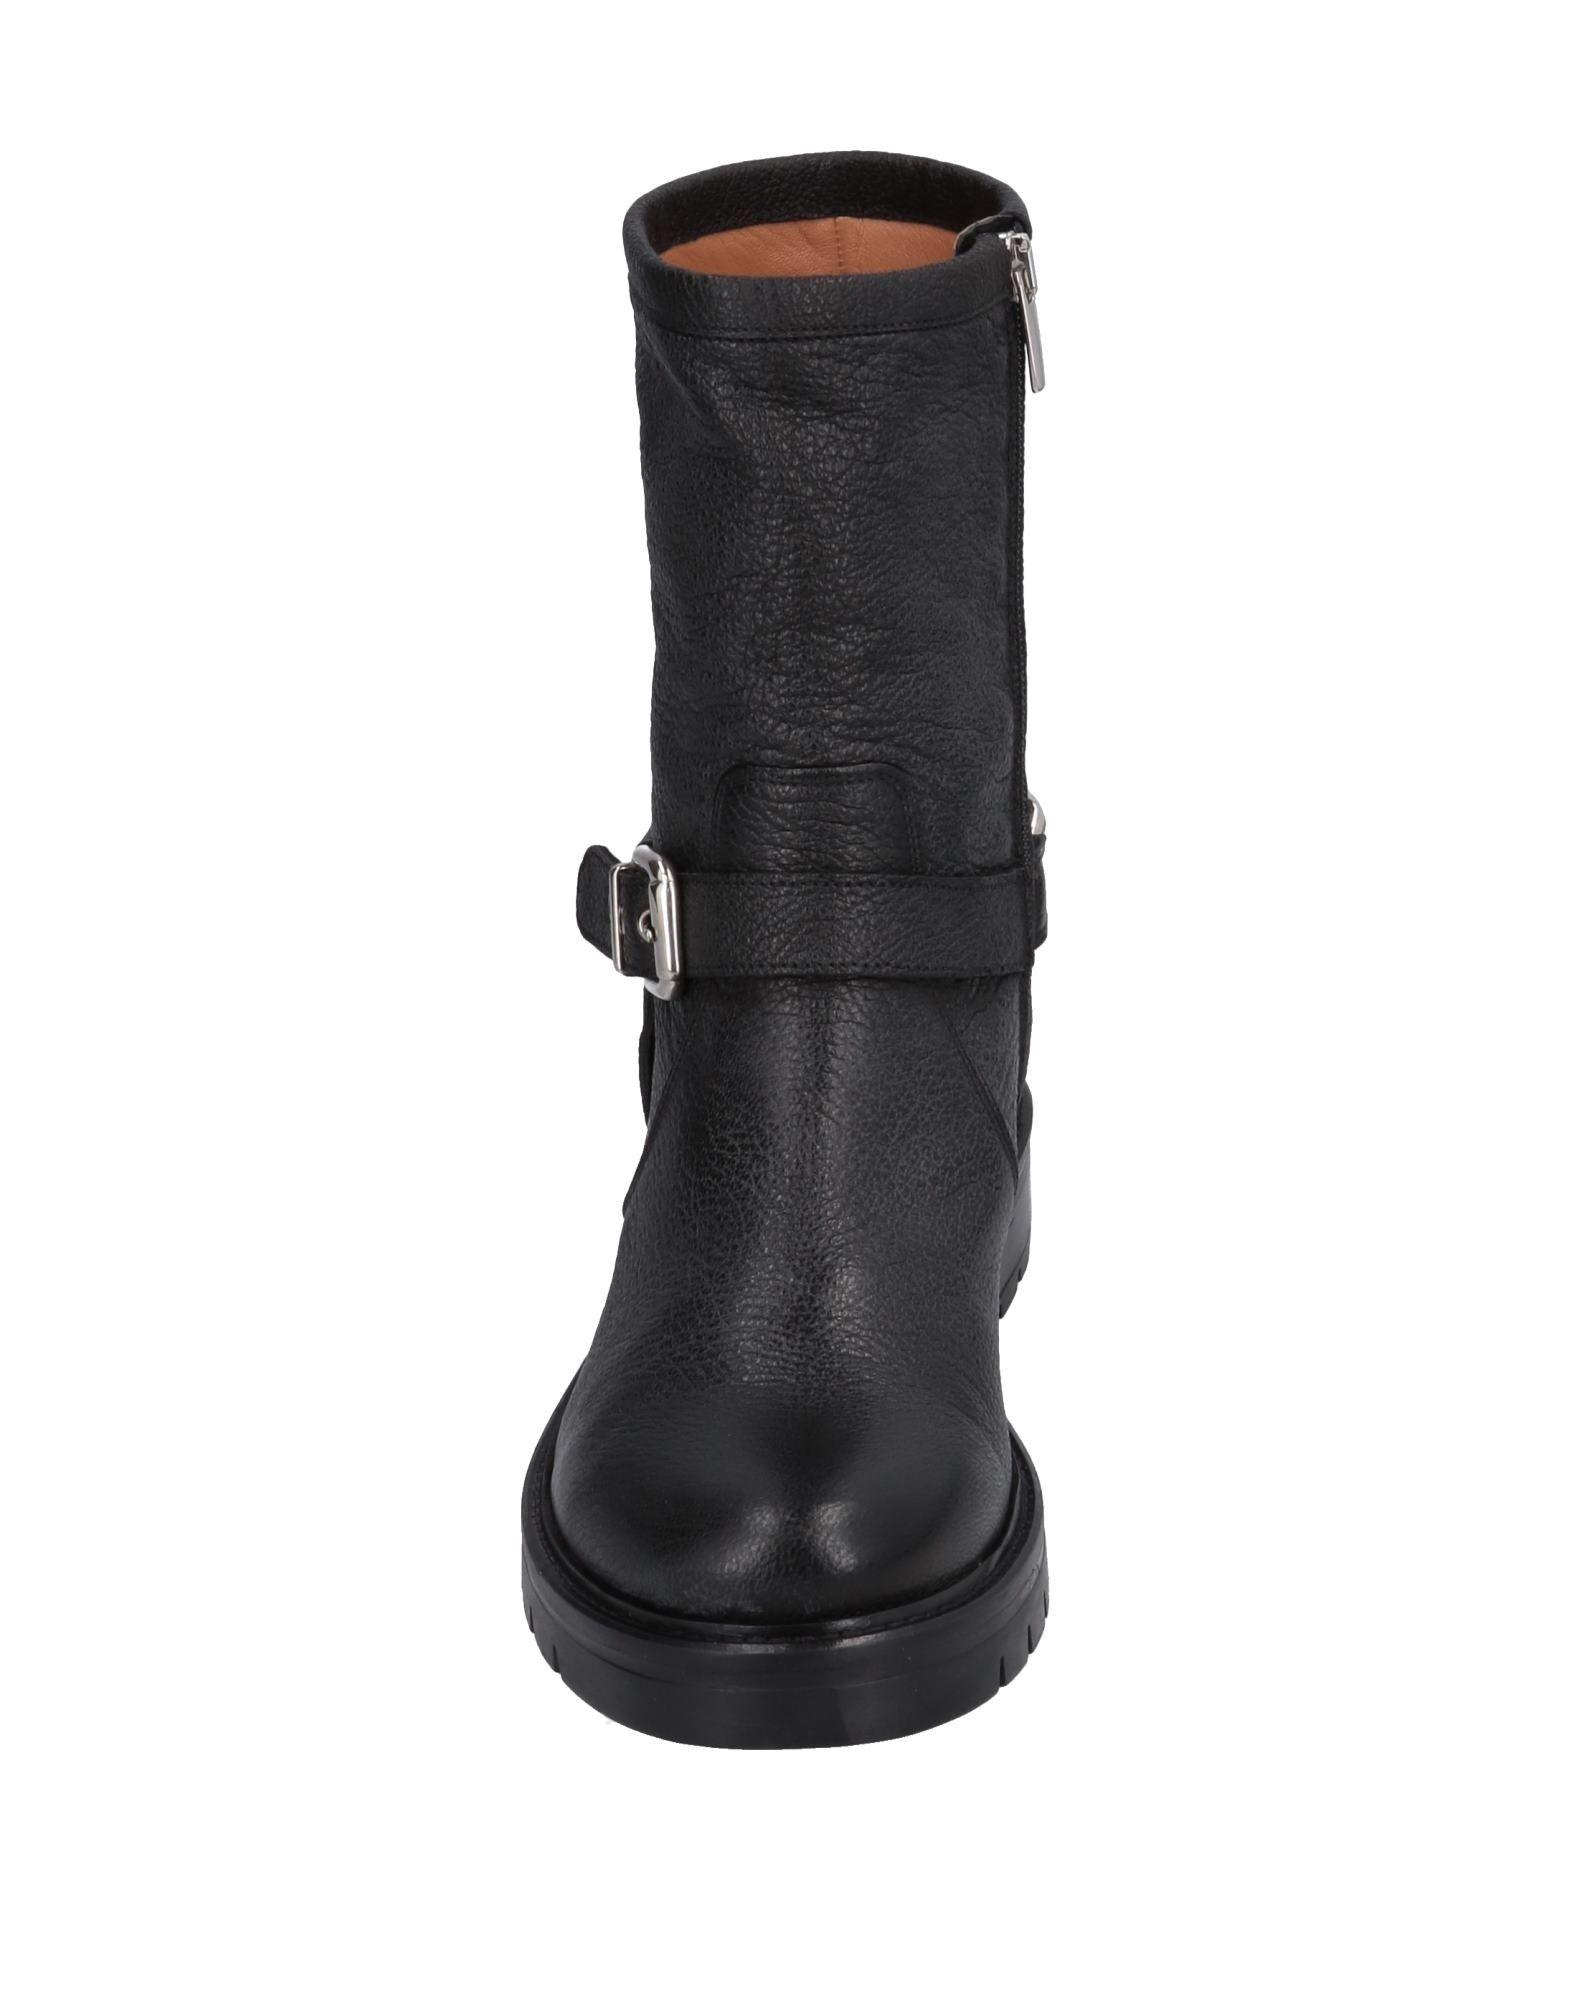 Stilvolle Bervicato billige Schuhe Angelo Bervicato Stilvolle Stiefelette Damen  11547259FN af9e1e